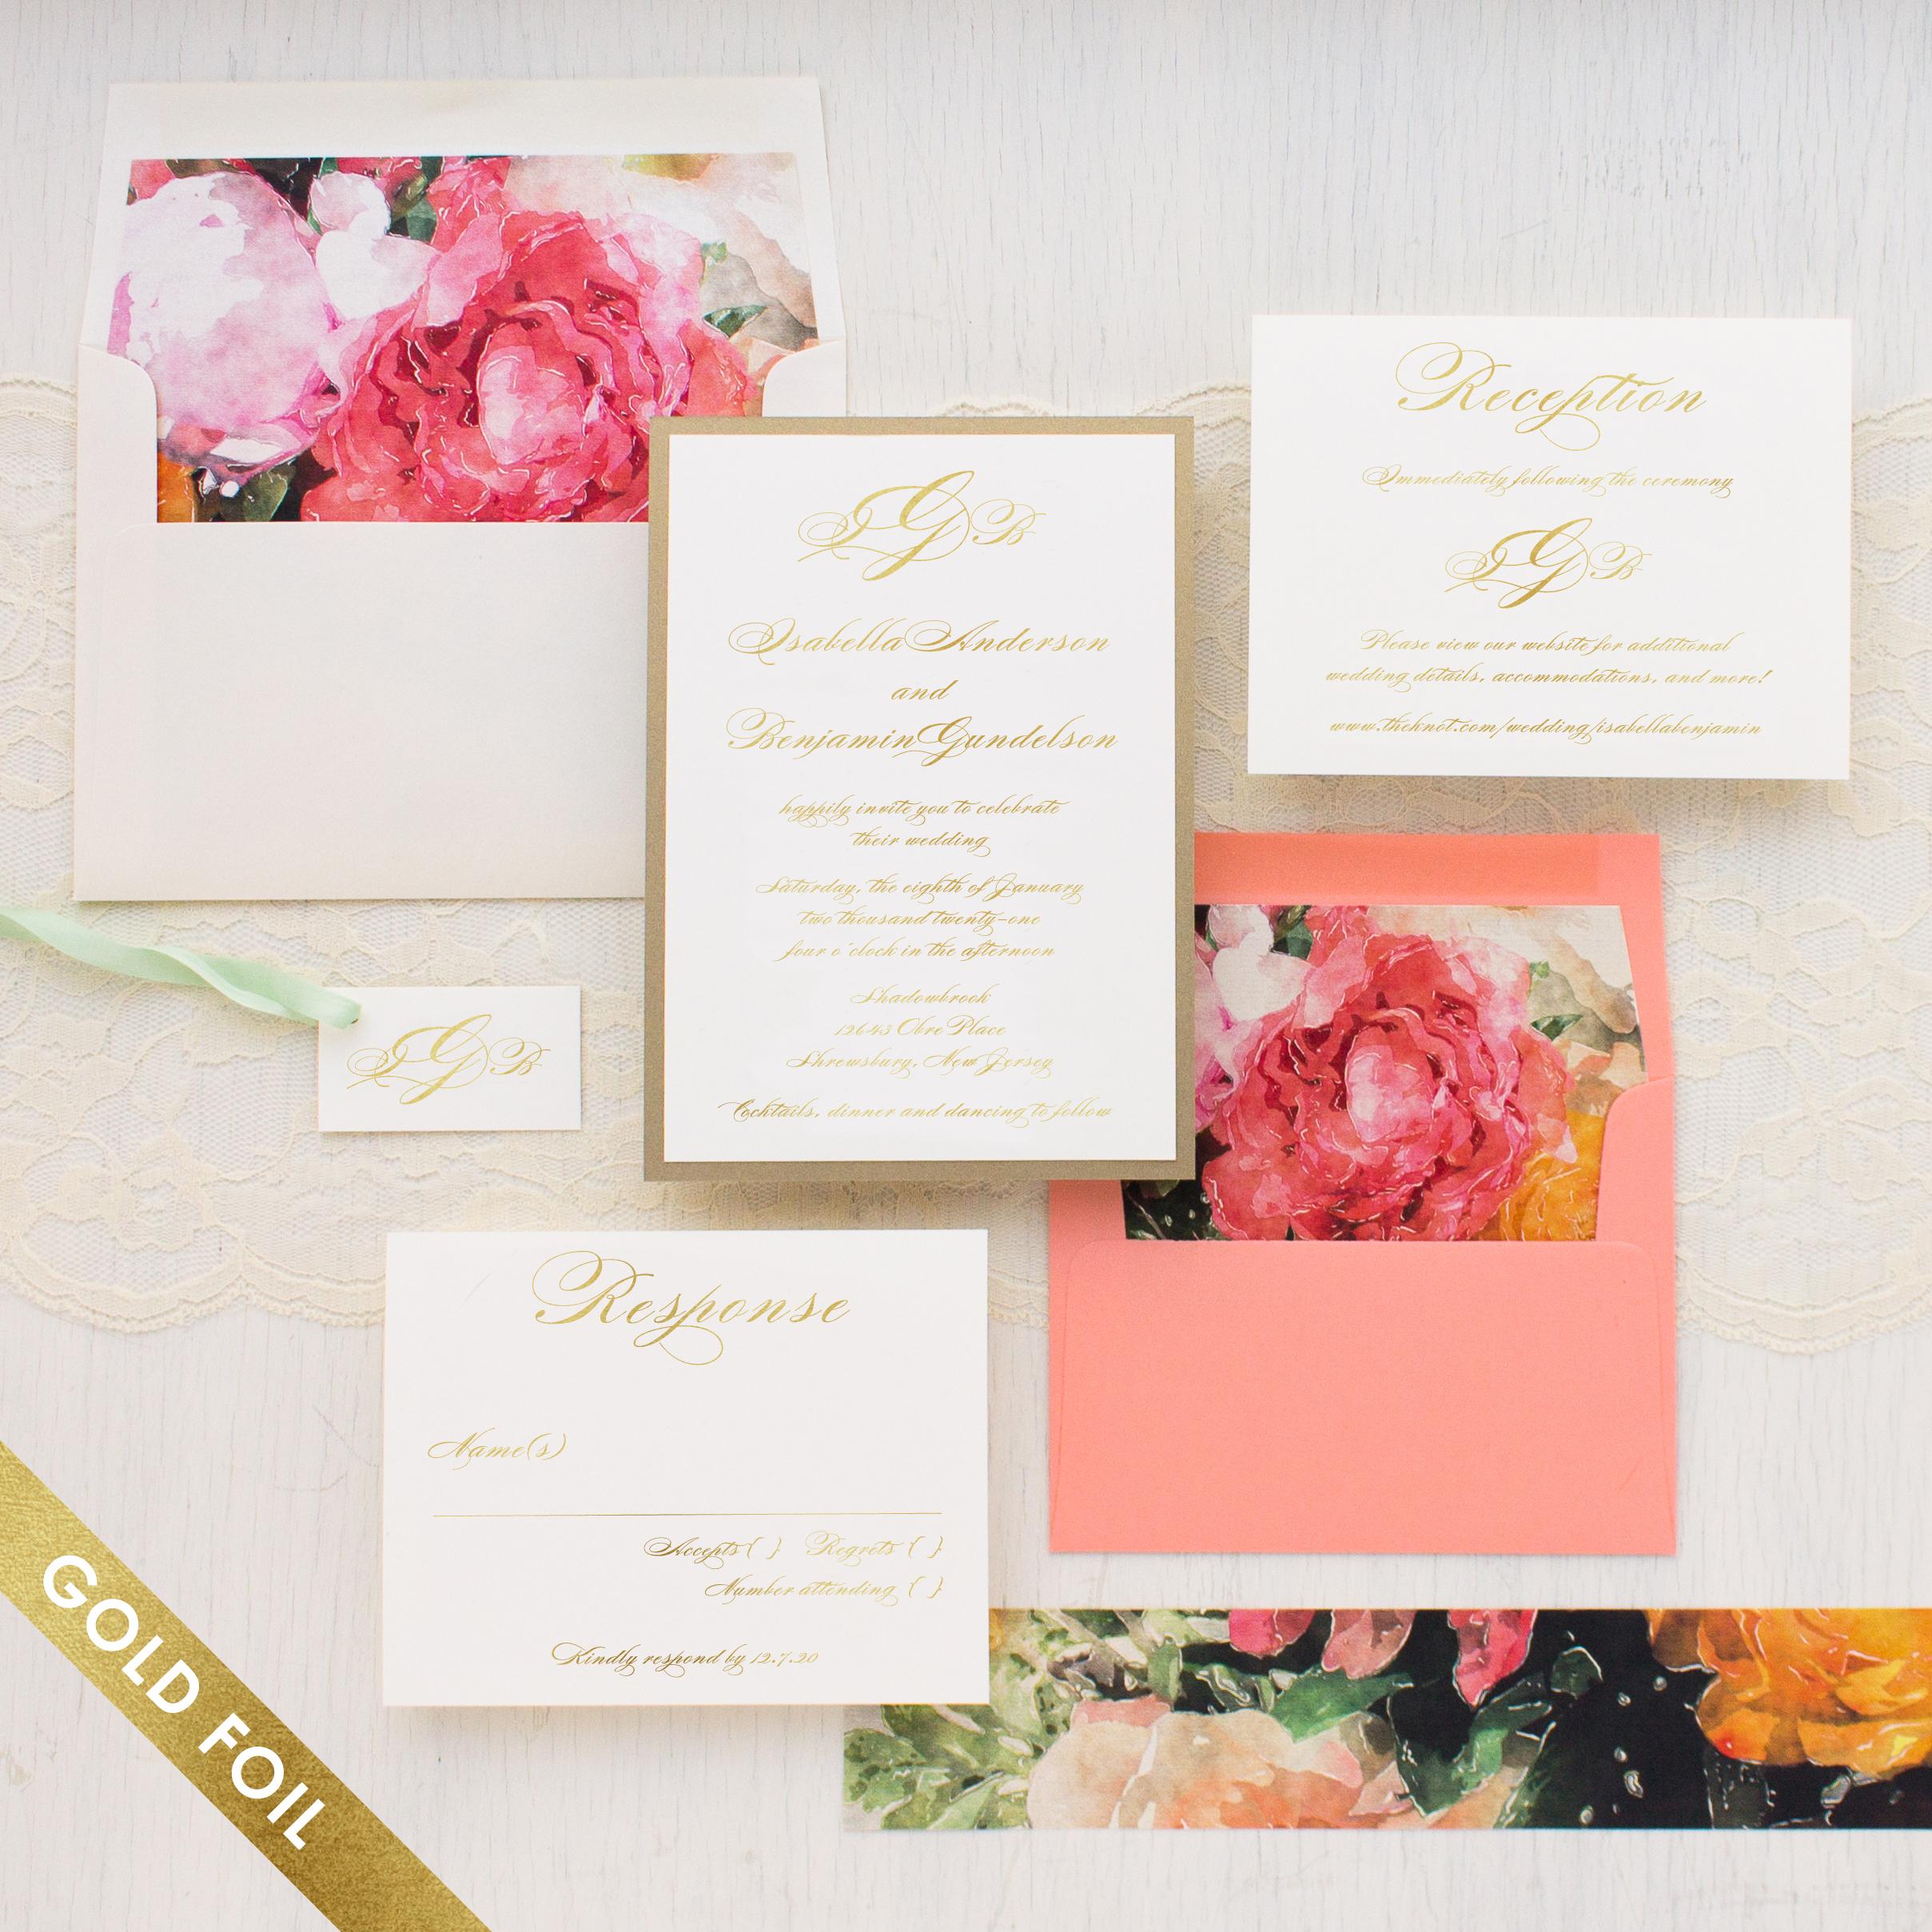 Pink Petals Gold Foil Wedding Invitations   Beacon Lane